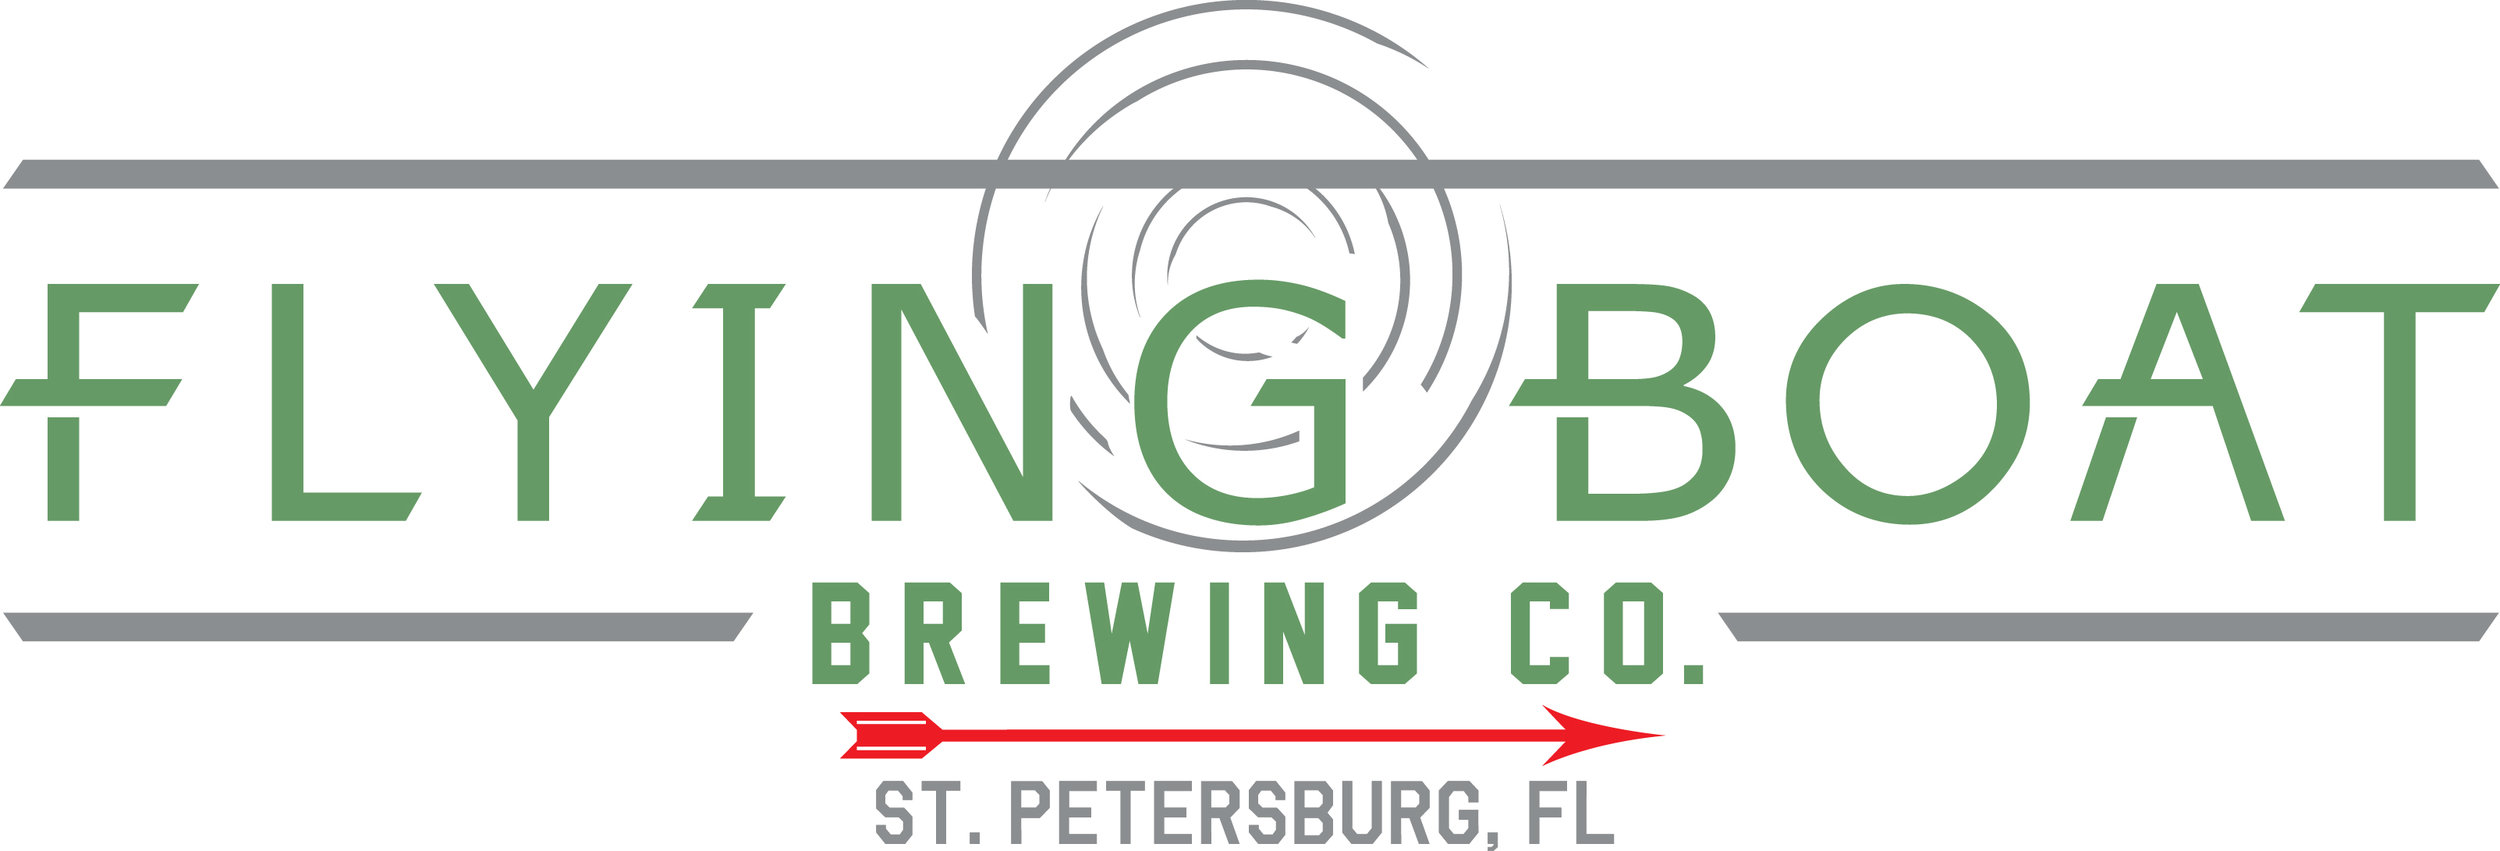 Flying-Boat-Official-Logo-2016.jpg